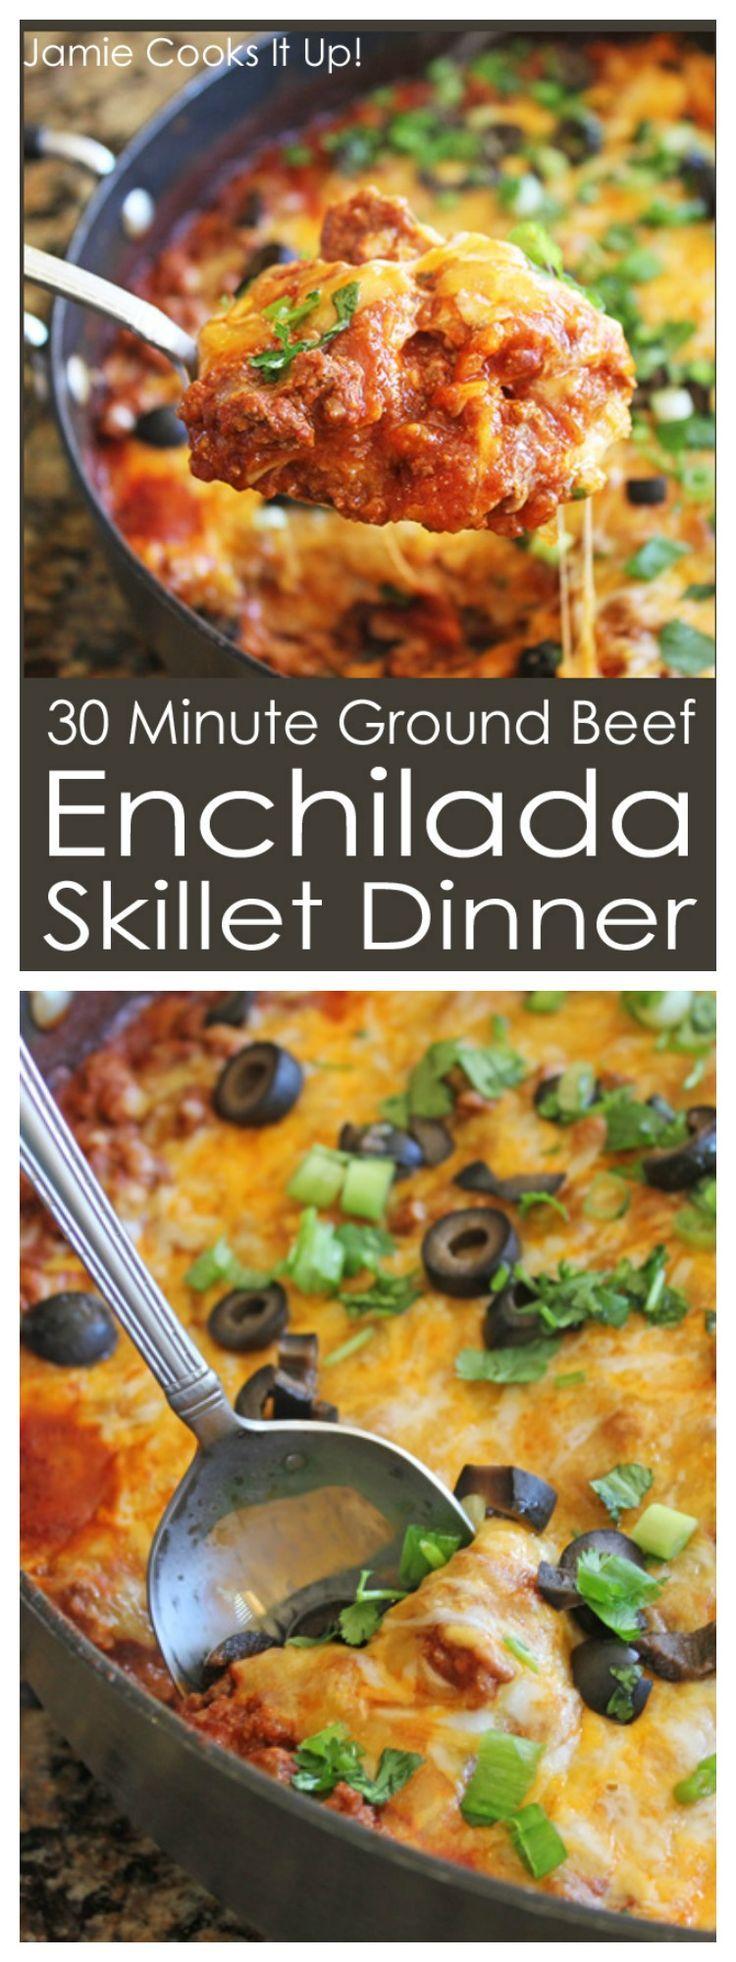 Photo of 30 Minute Ground Beef Enchilada Skillet Dinner